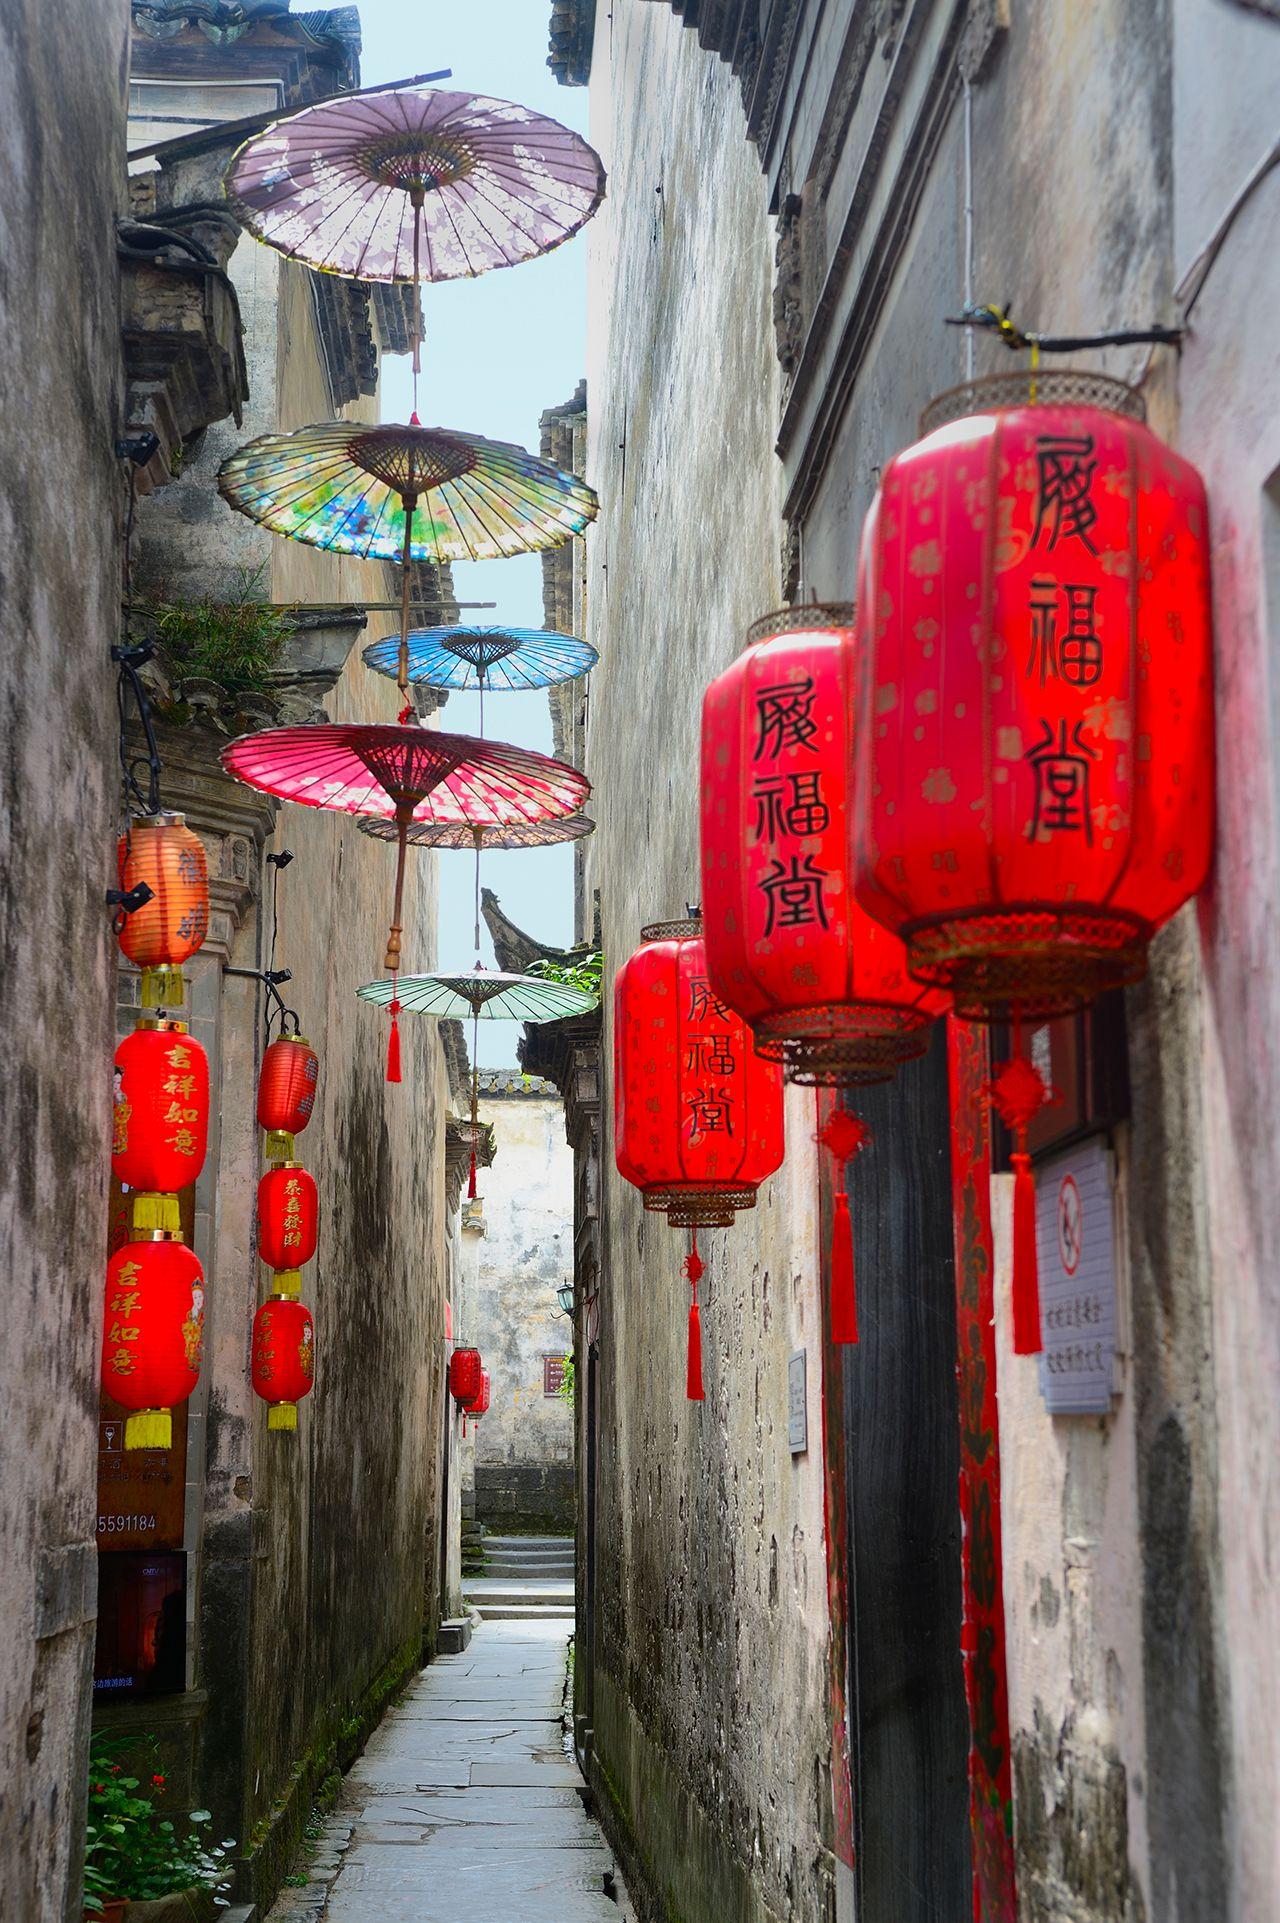 Red Lanterns and Parasols